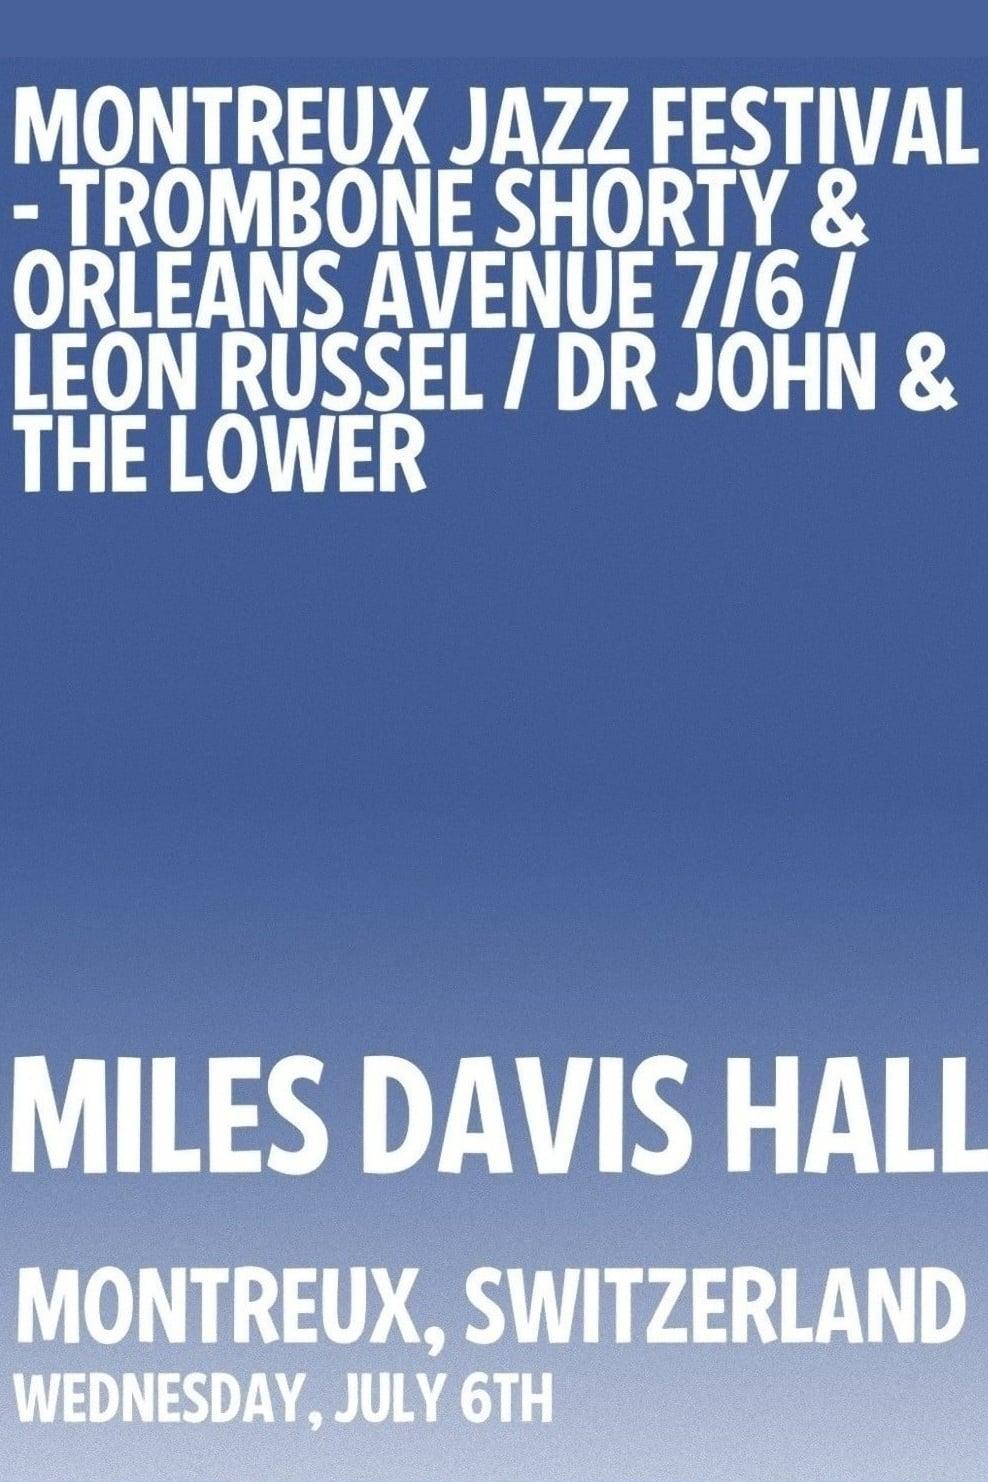 Dr. John & The Lower 911 - Montreux Jazz Festival